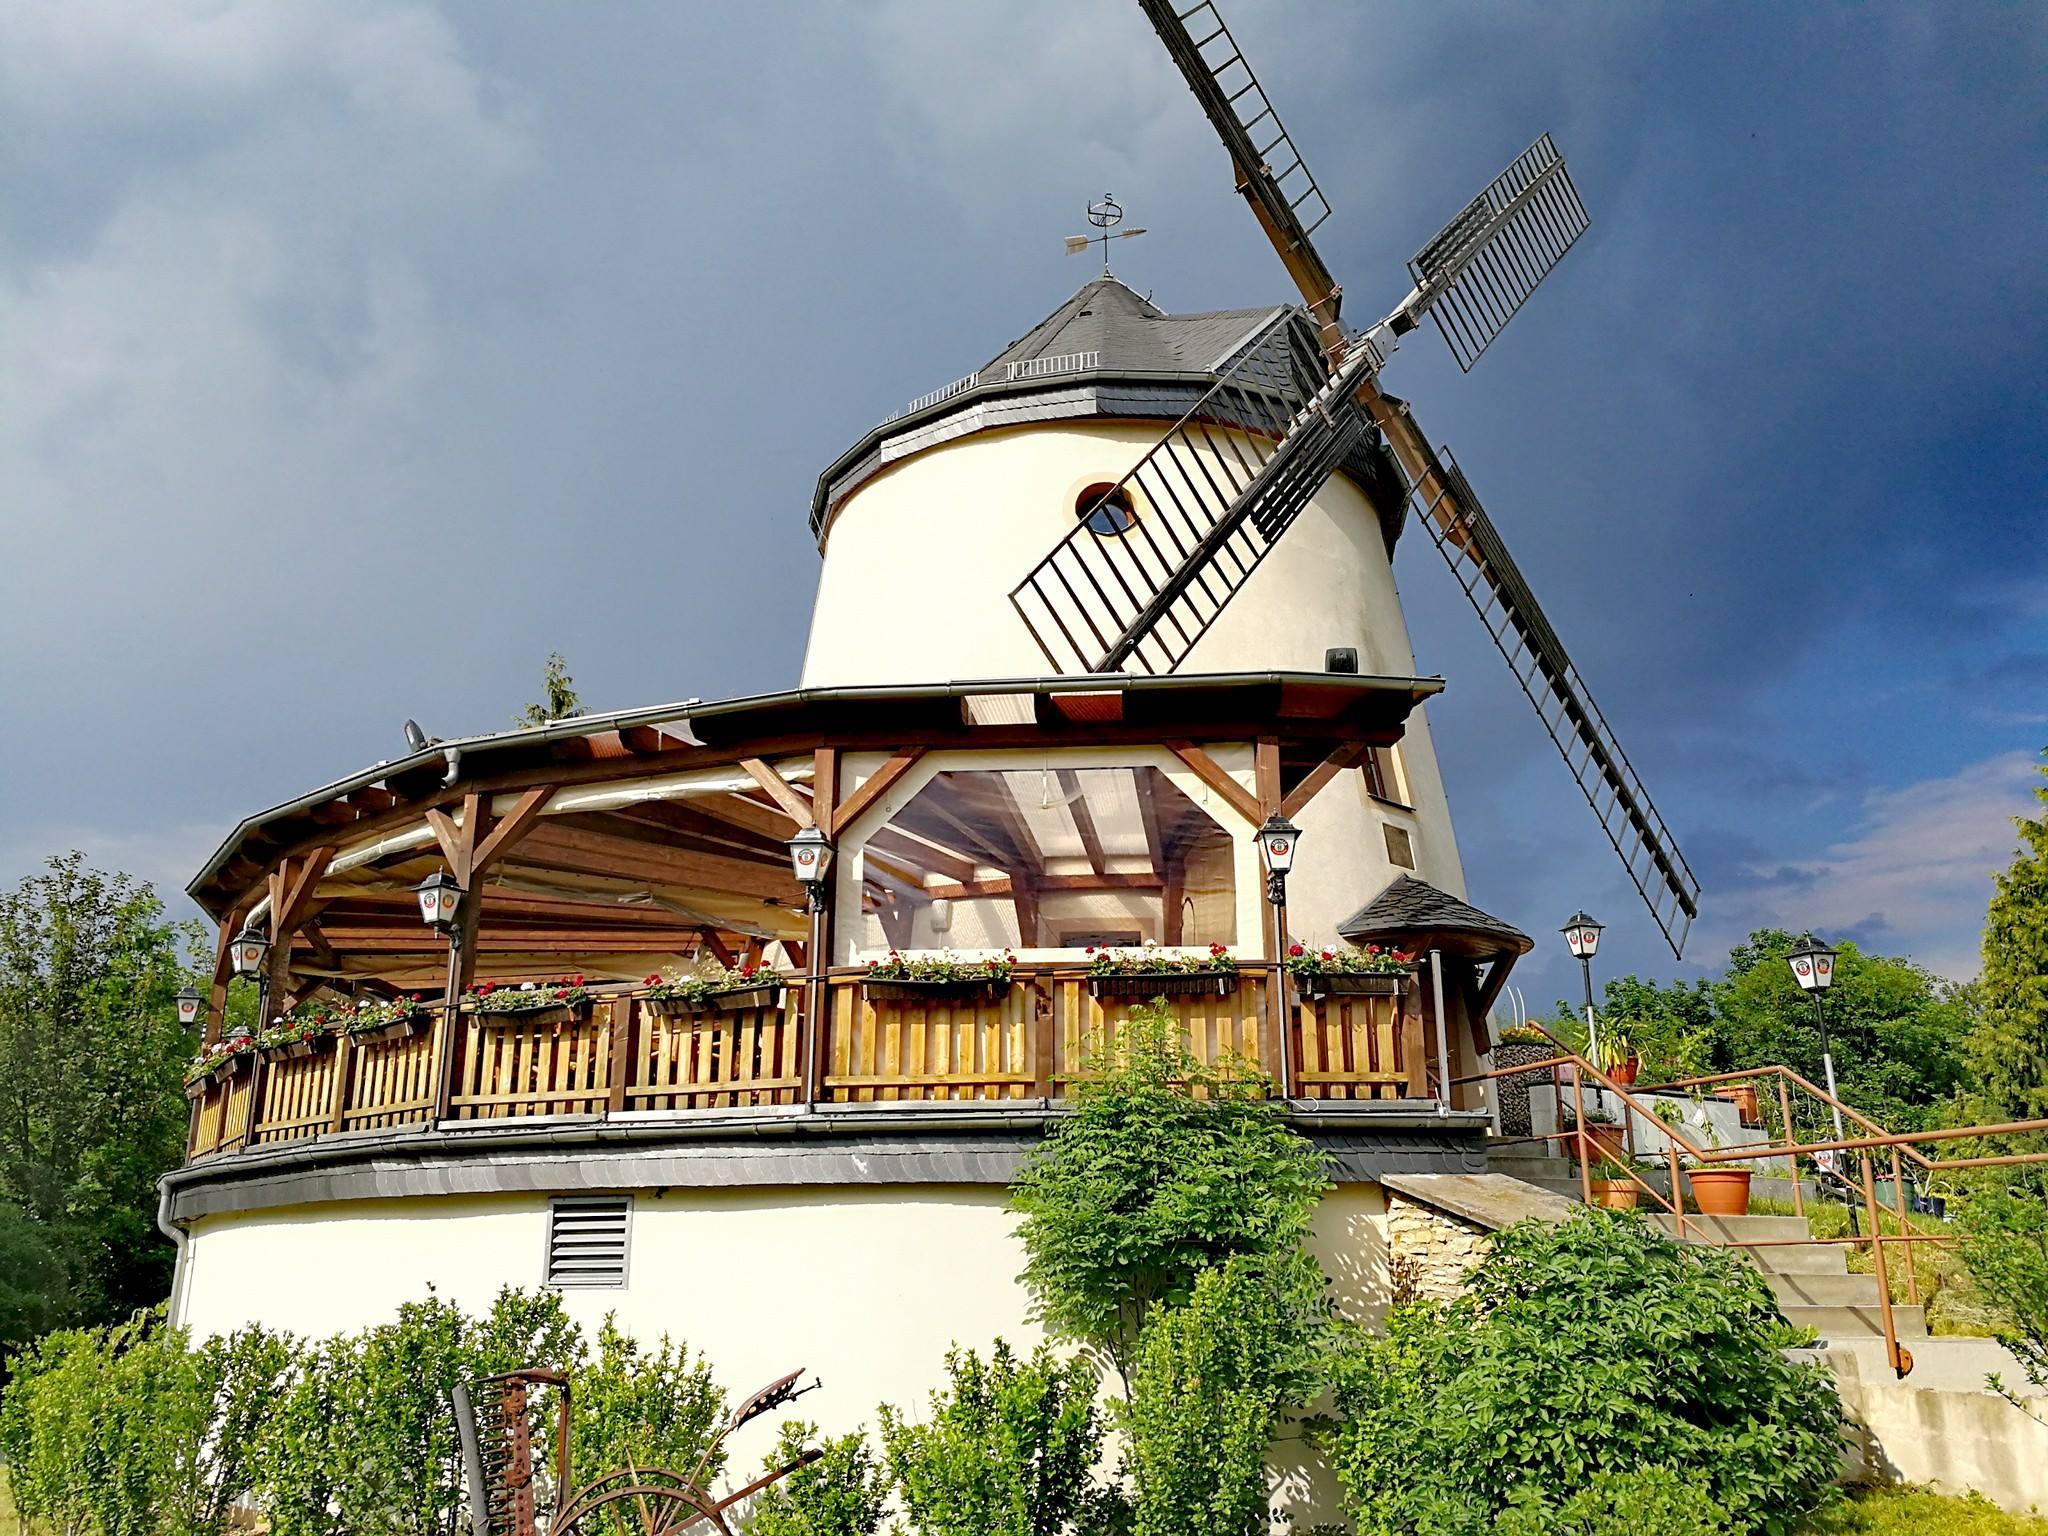 Mühle mit dunklen Himmel